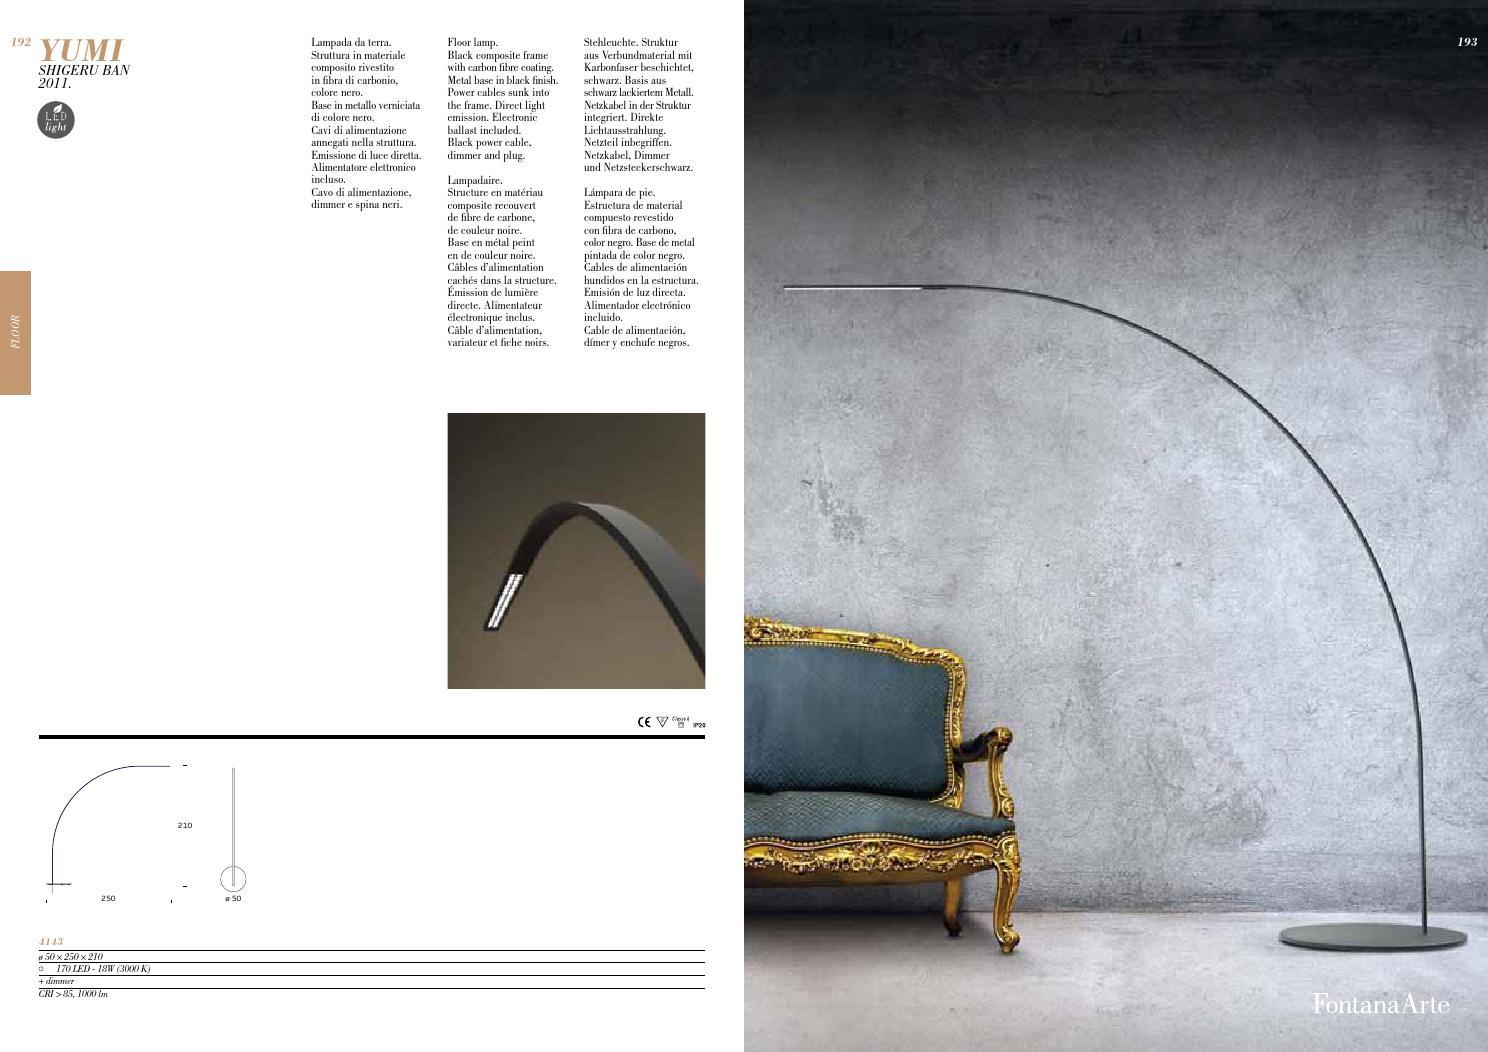 Lampada Da Studio Design fontanaarte catalogue 2012 by fabrika sveta - issuu